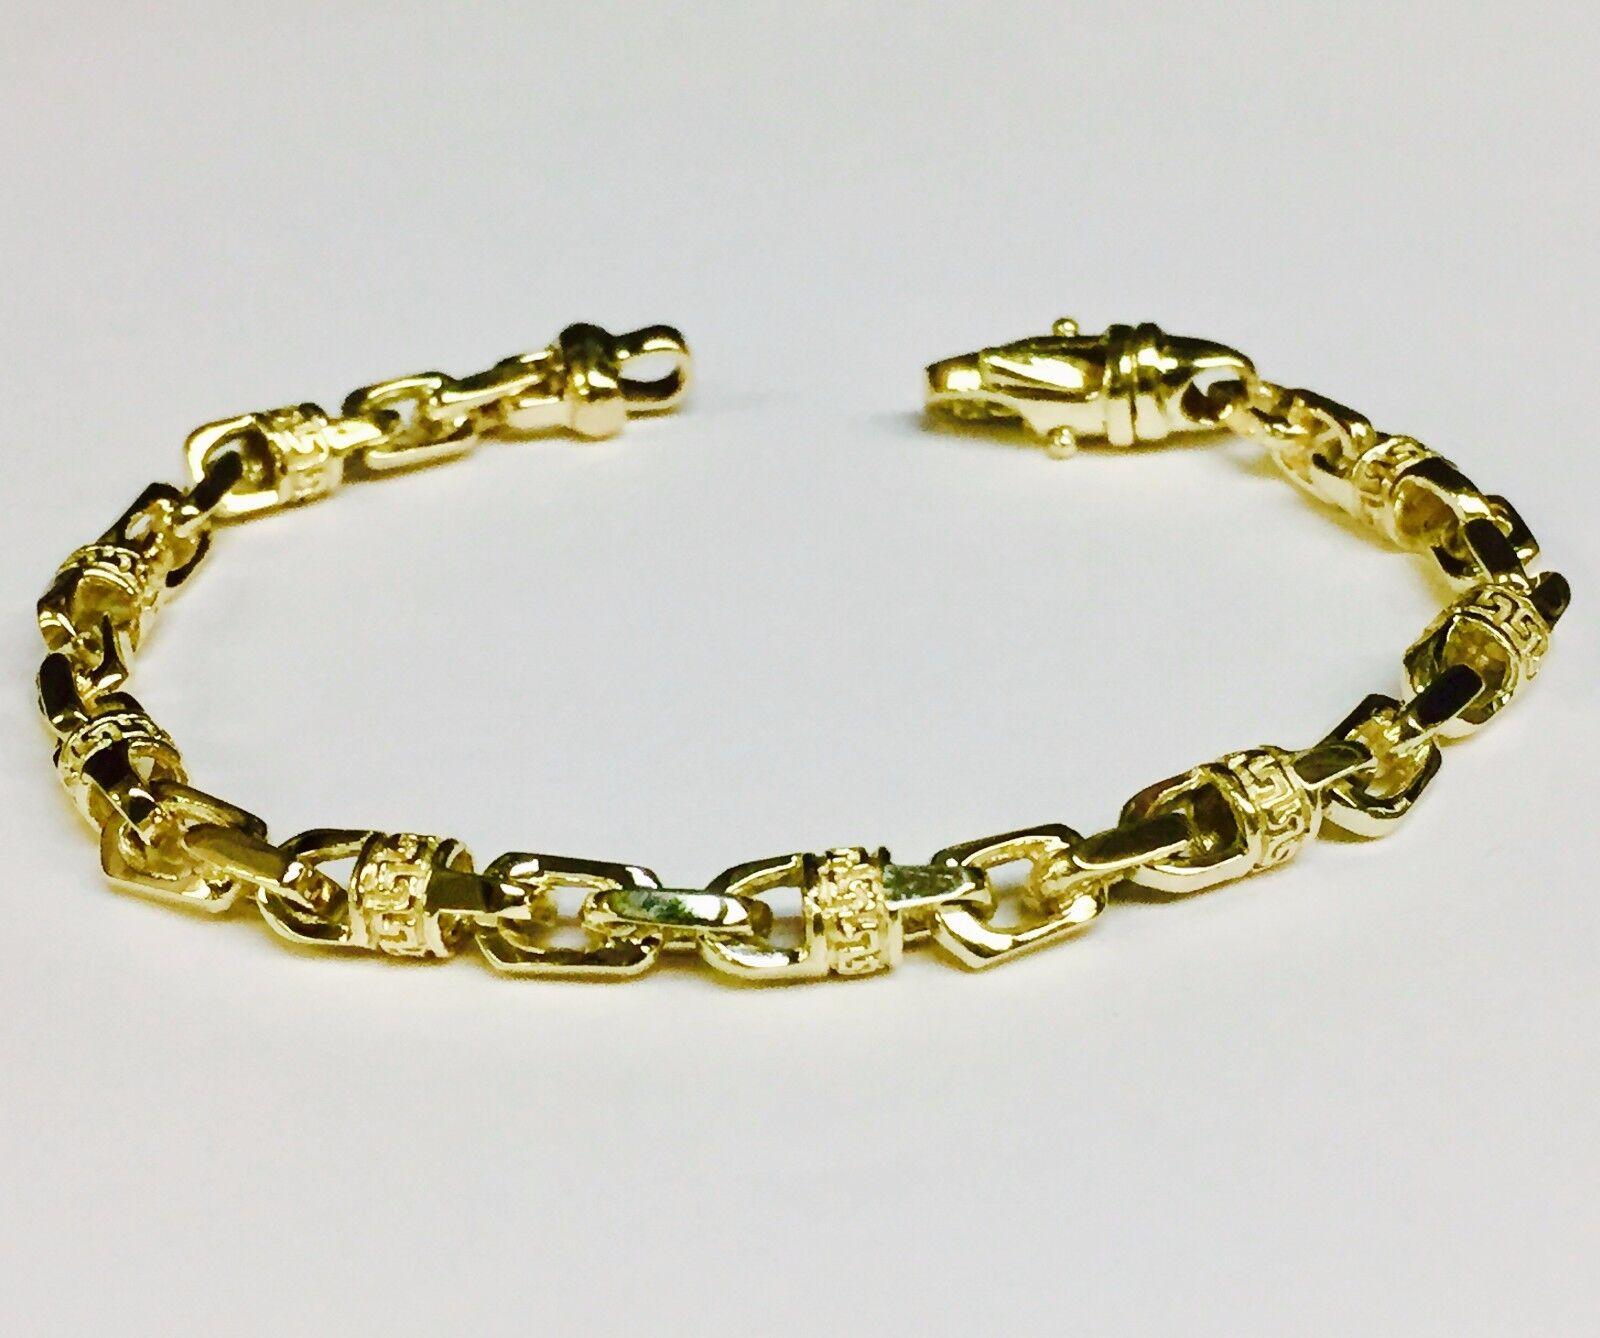 10k solid yellow gold handmade link men 39 s chain necklace. Black Bedroom Furniture Sets. Home Design Ideas